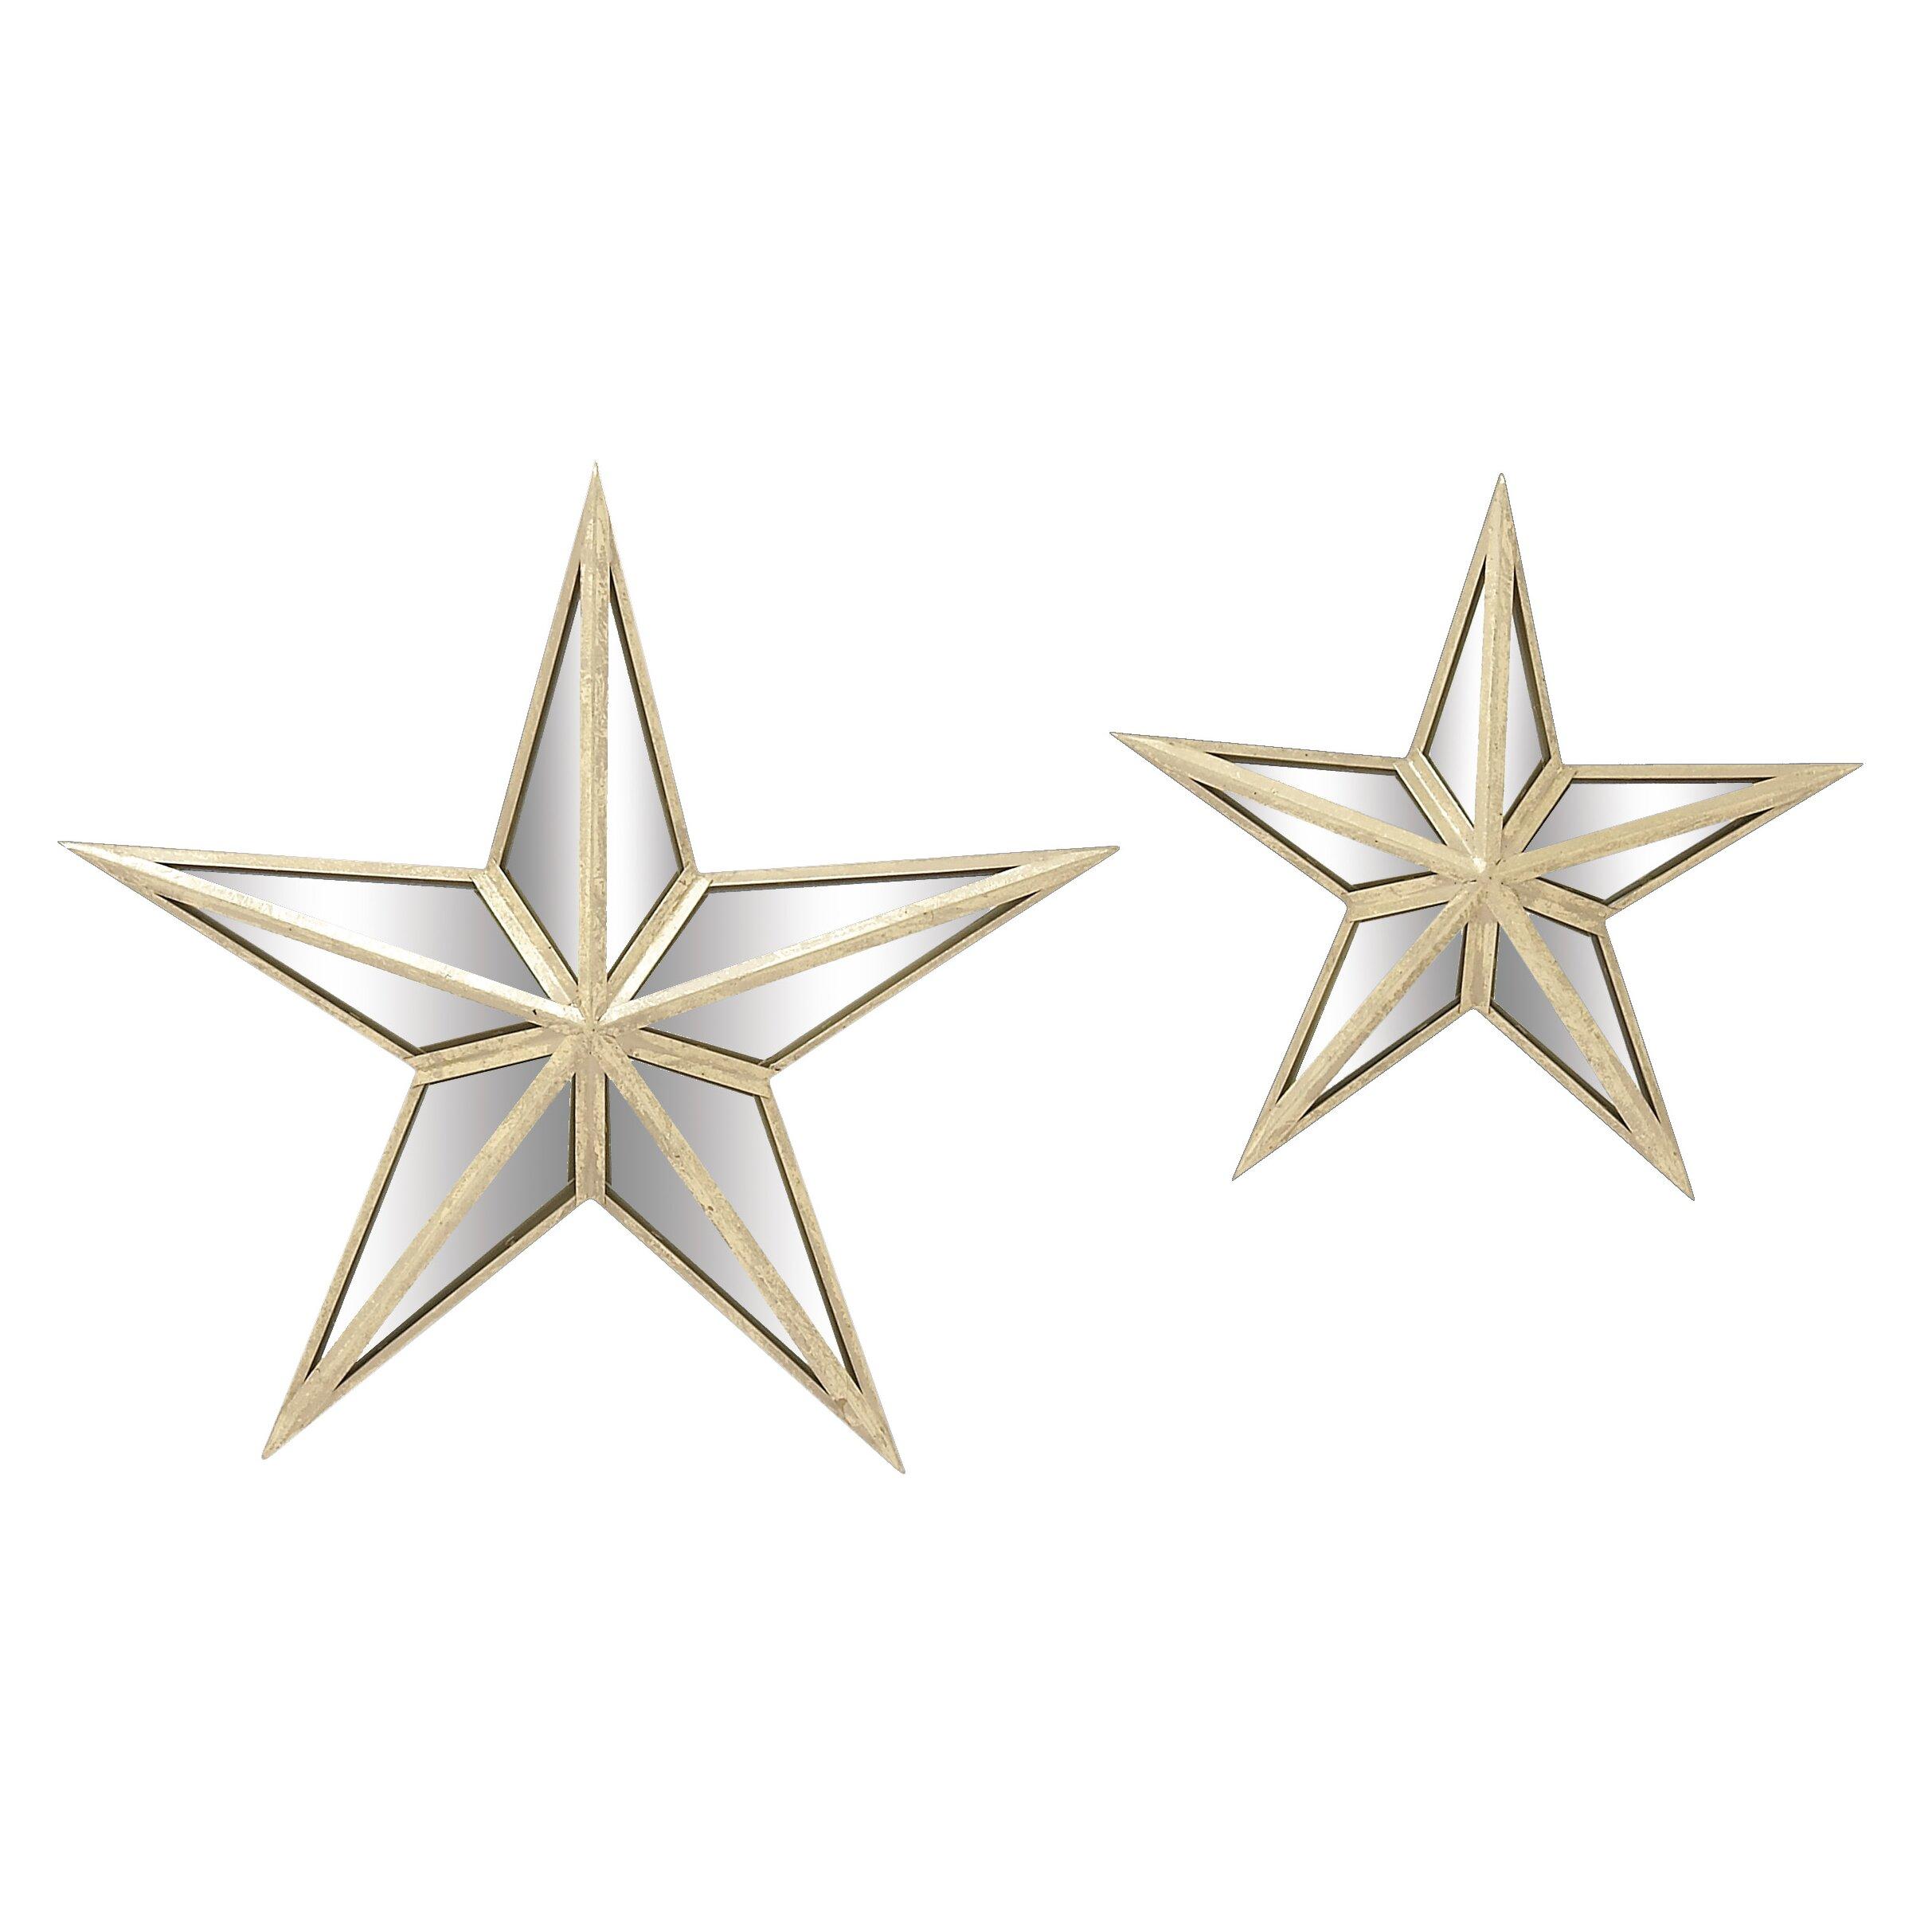 Woodland Imports 2 Piece Star Wall Mirror Set Amp Reviews